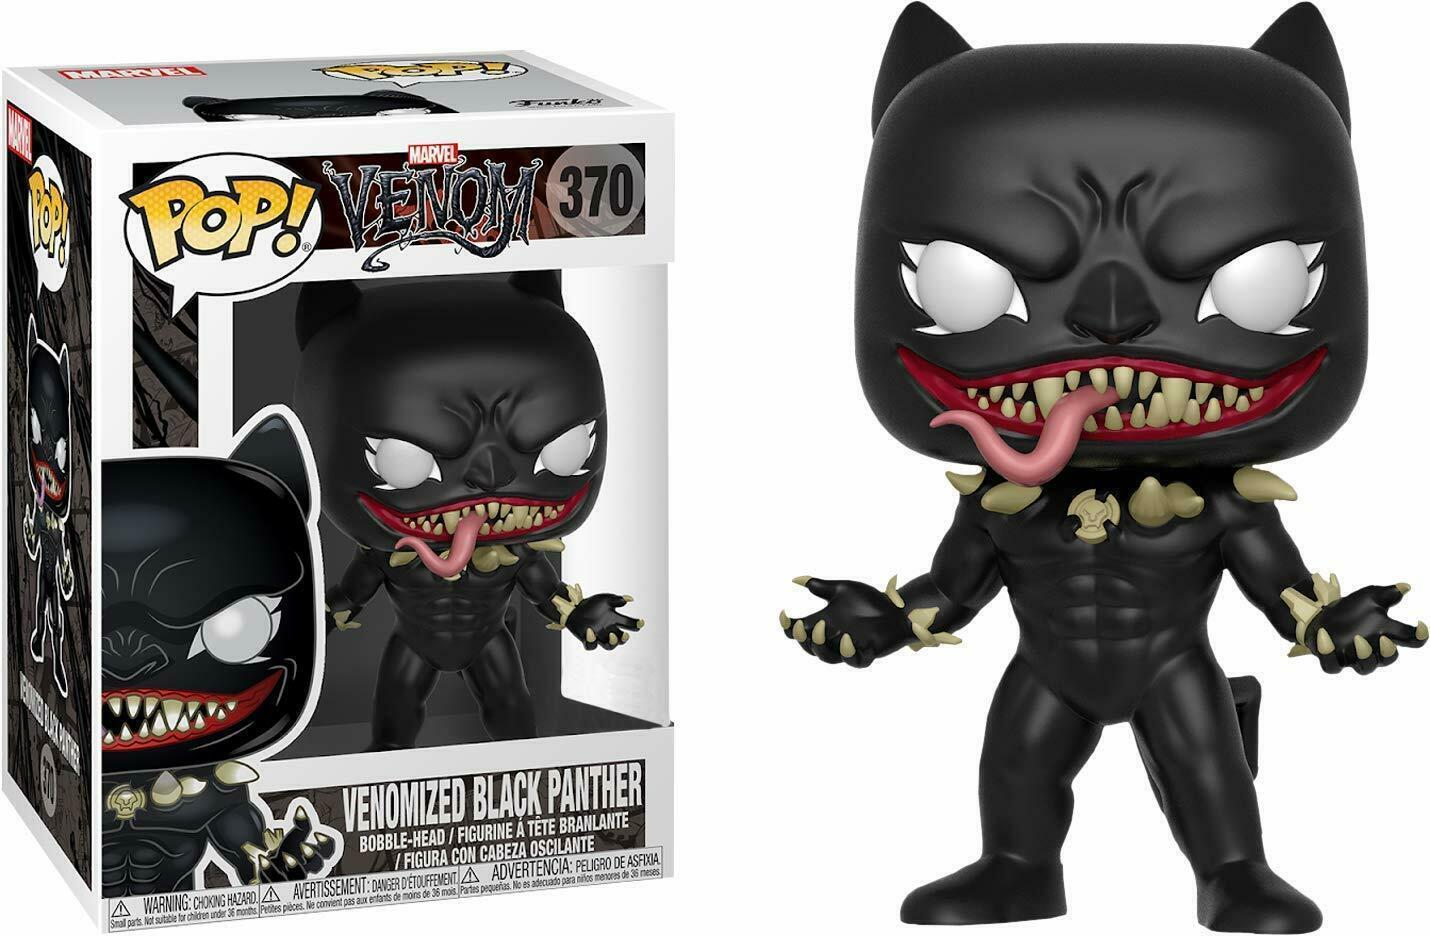 Funko Pop Venom Venomized Black Panther Pop! Vinyl Action Figure